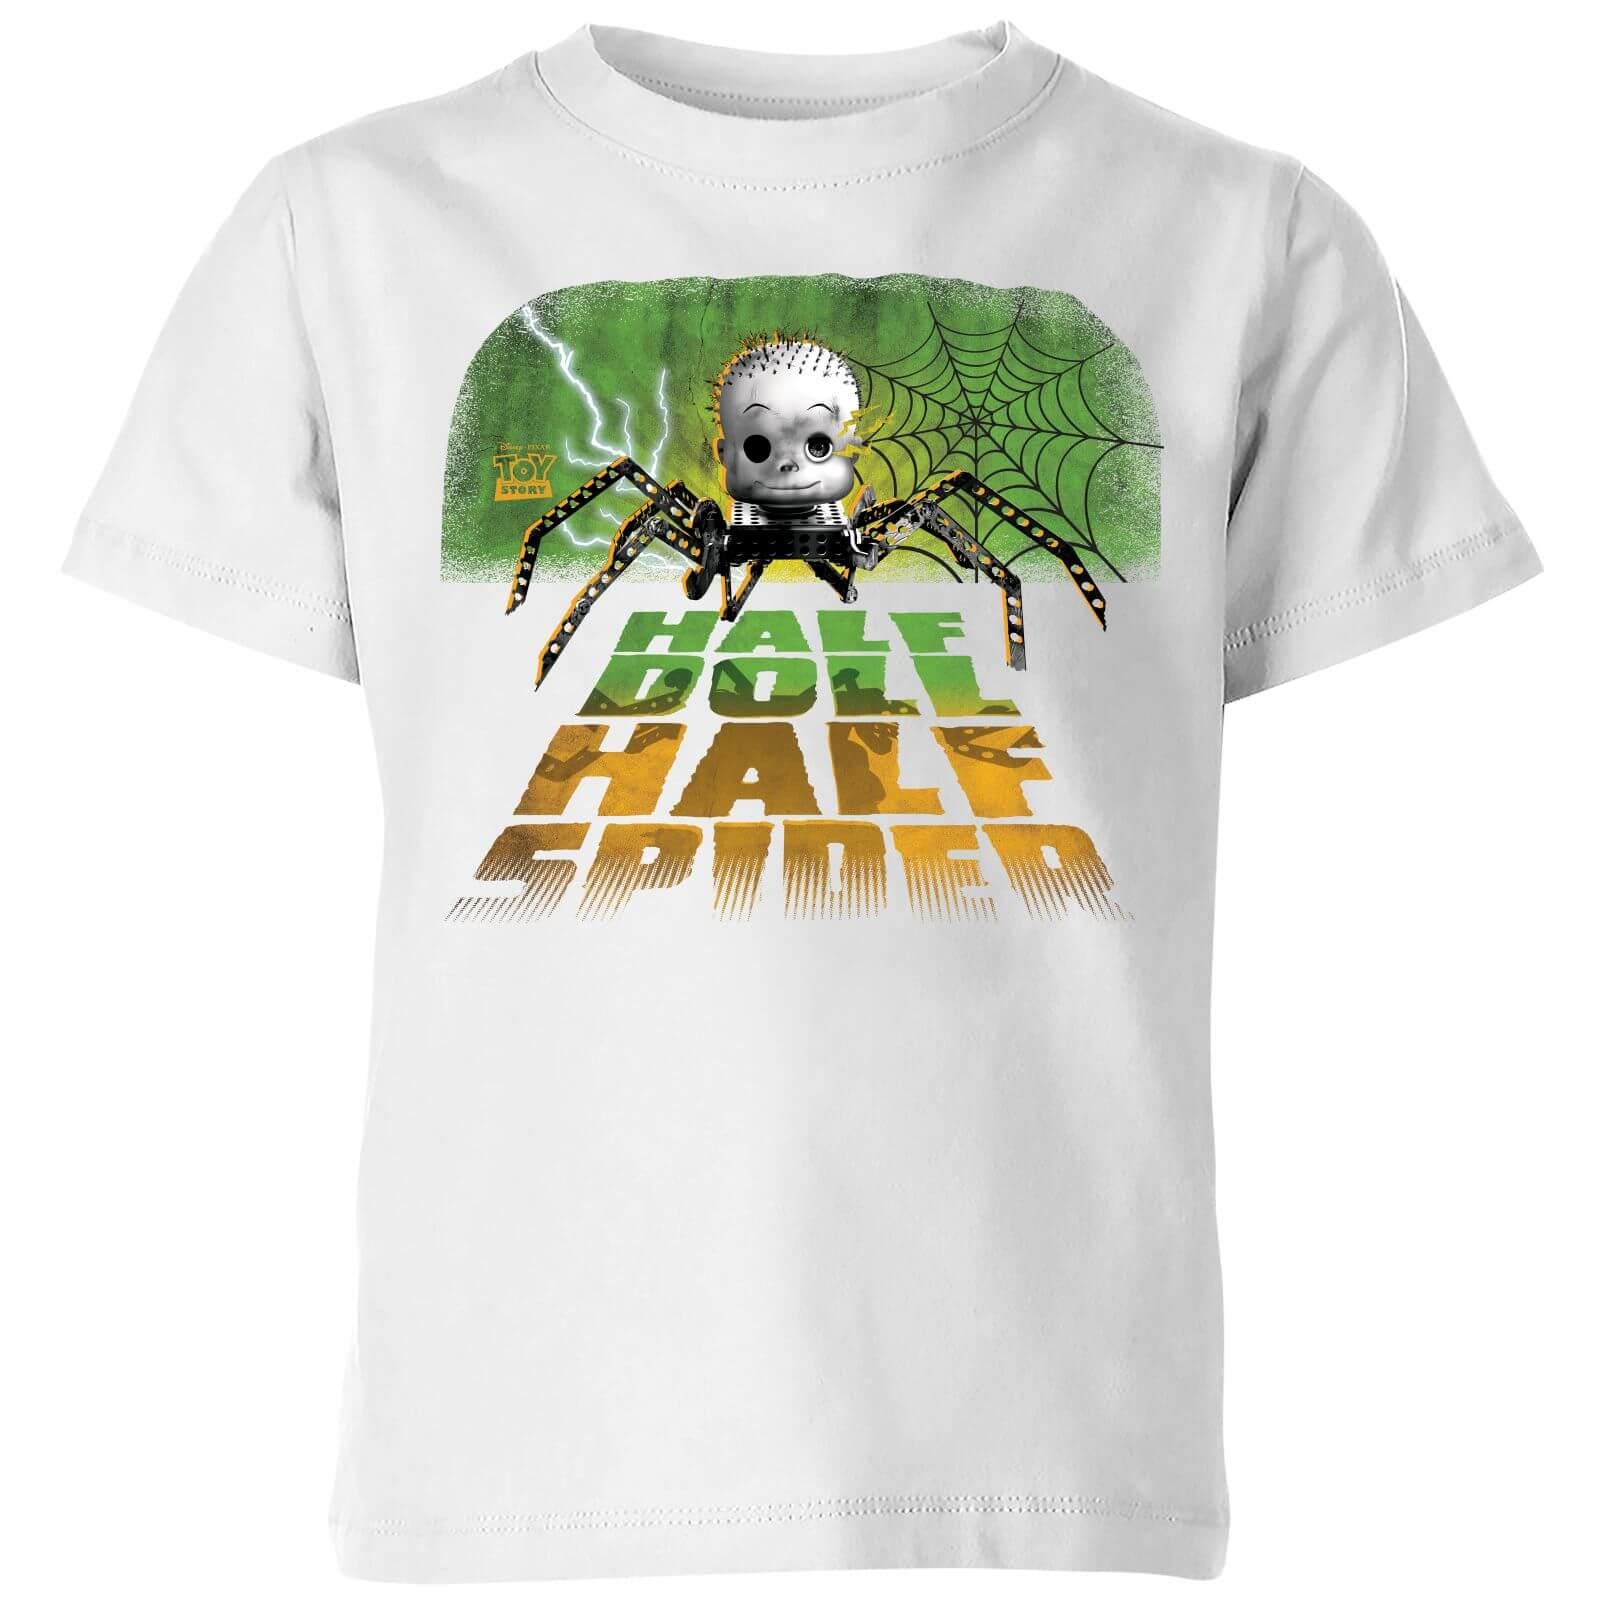 def059a50 Camiseta Disney Toy Story Bebé Tarántula - Niño - Blanco Clothing ...